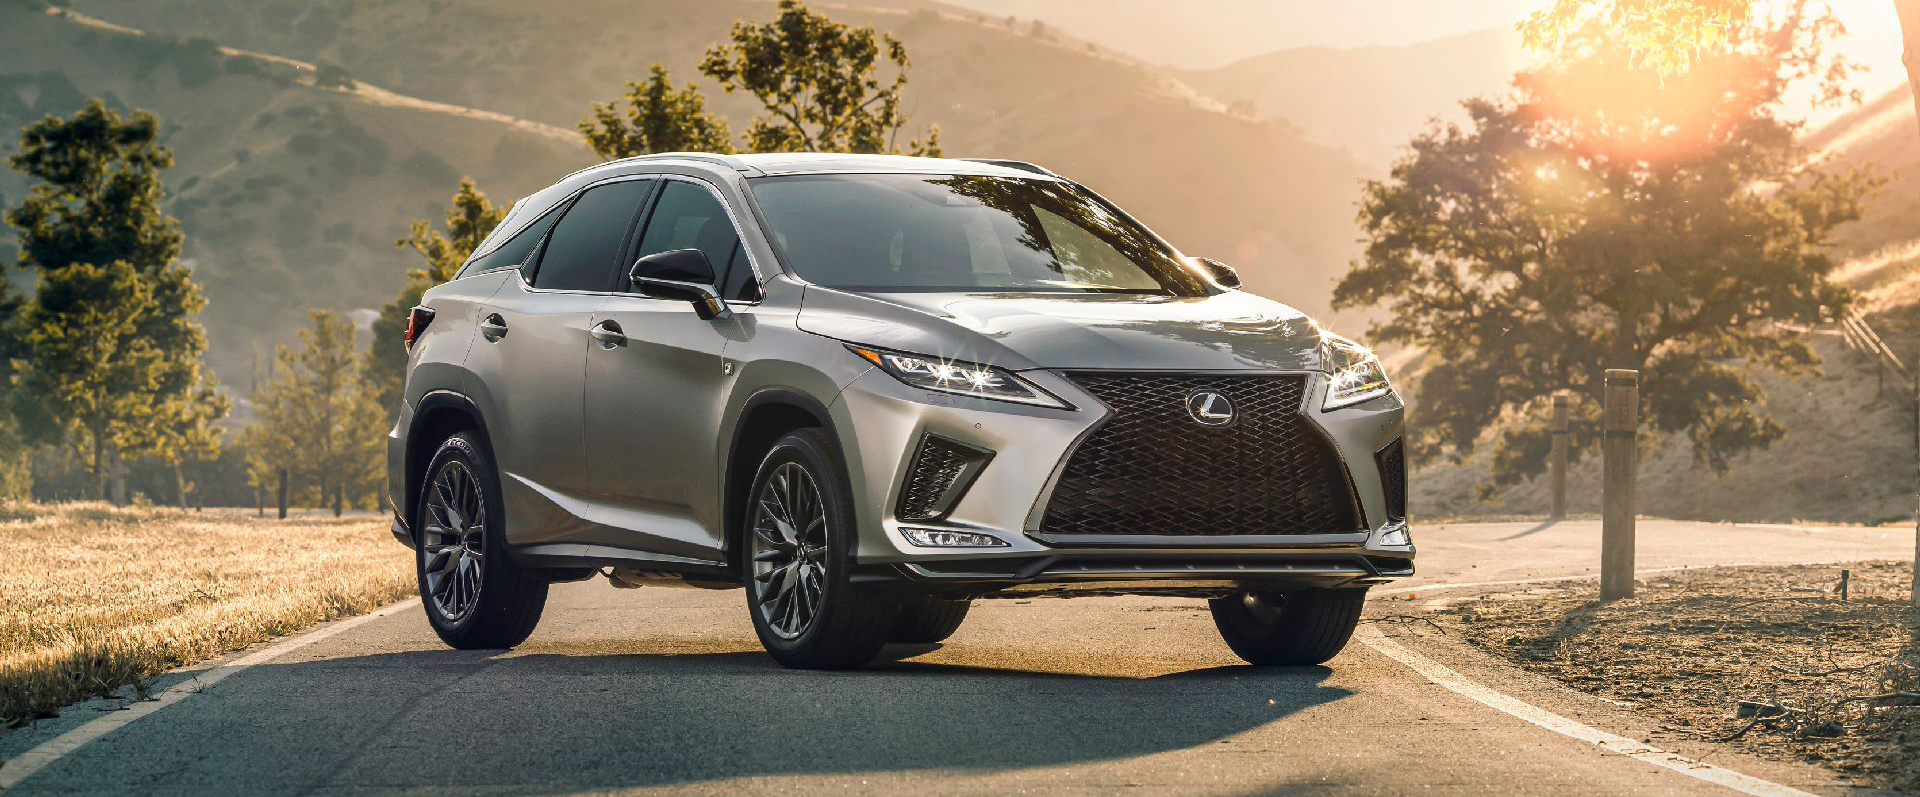 Lexus RX 2020 nâng cấp facelift - 0